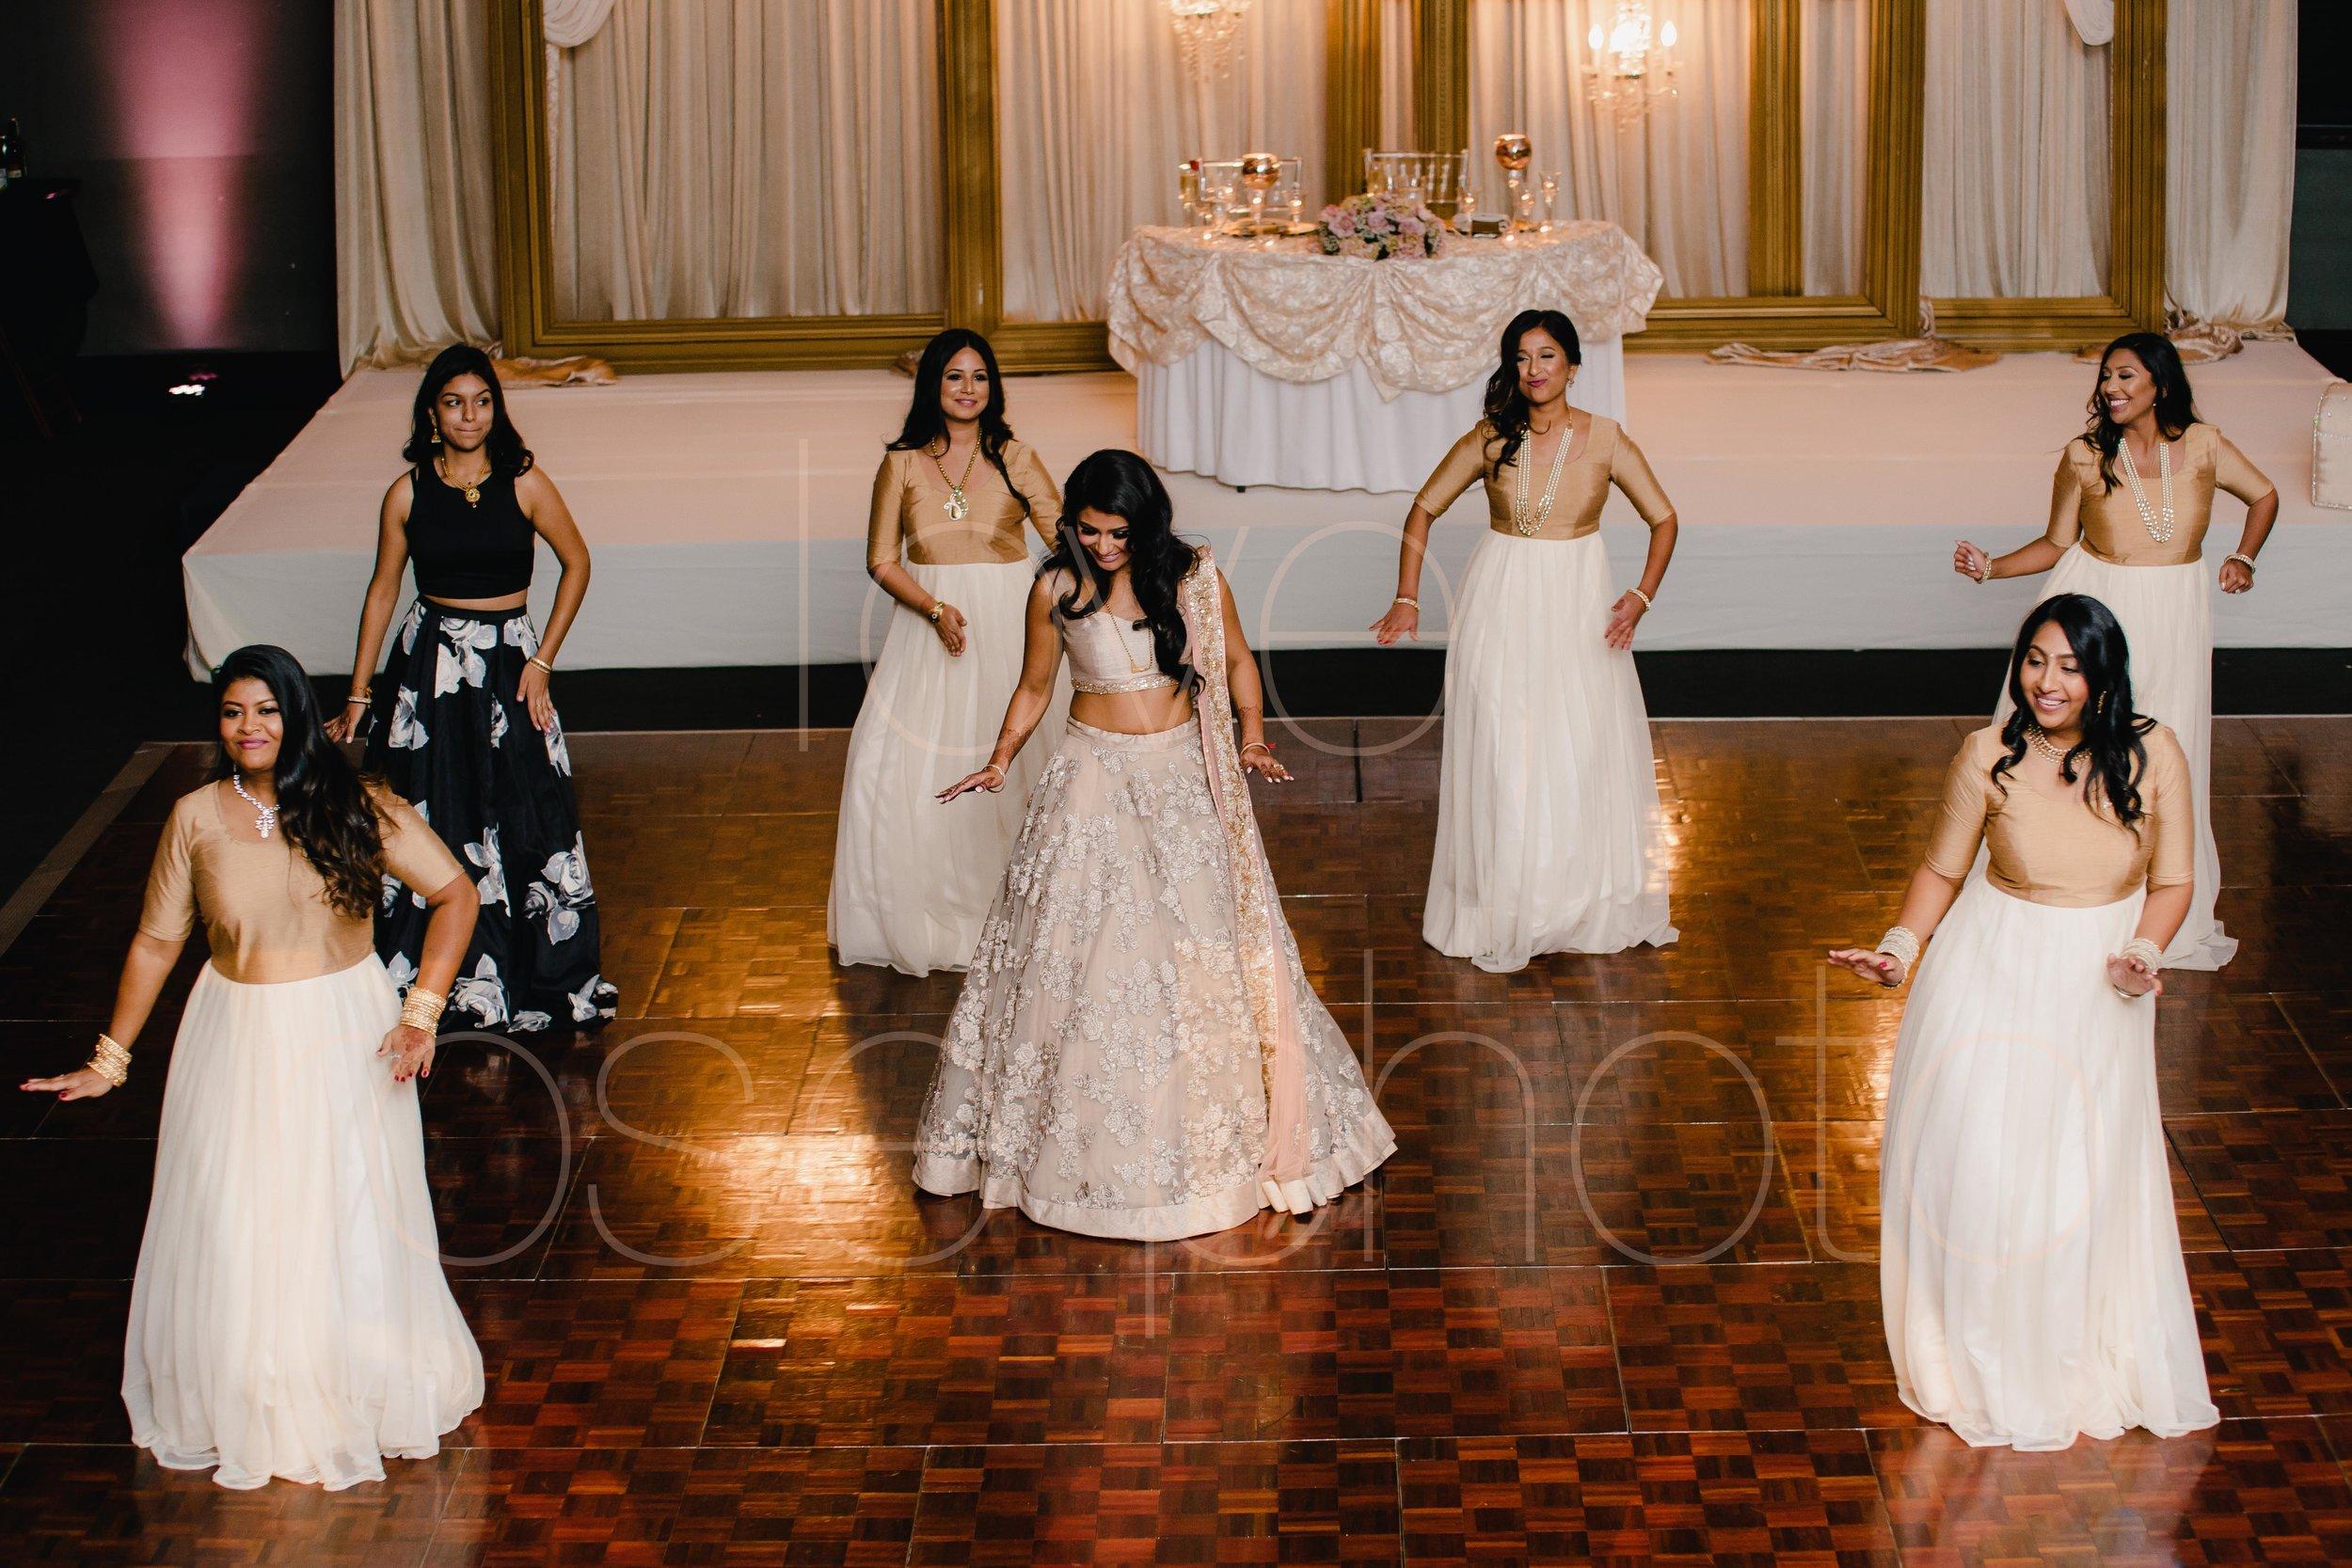 Chicago Indian Wedding best photography lifestyle wedding portrait luxury wedding-69.jpg